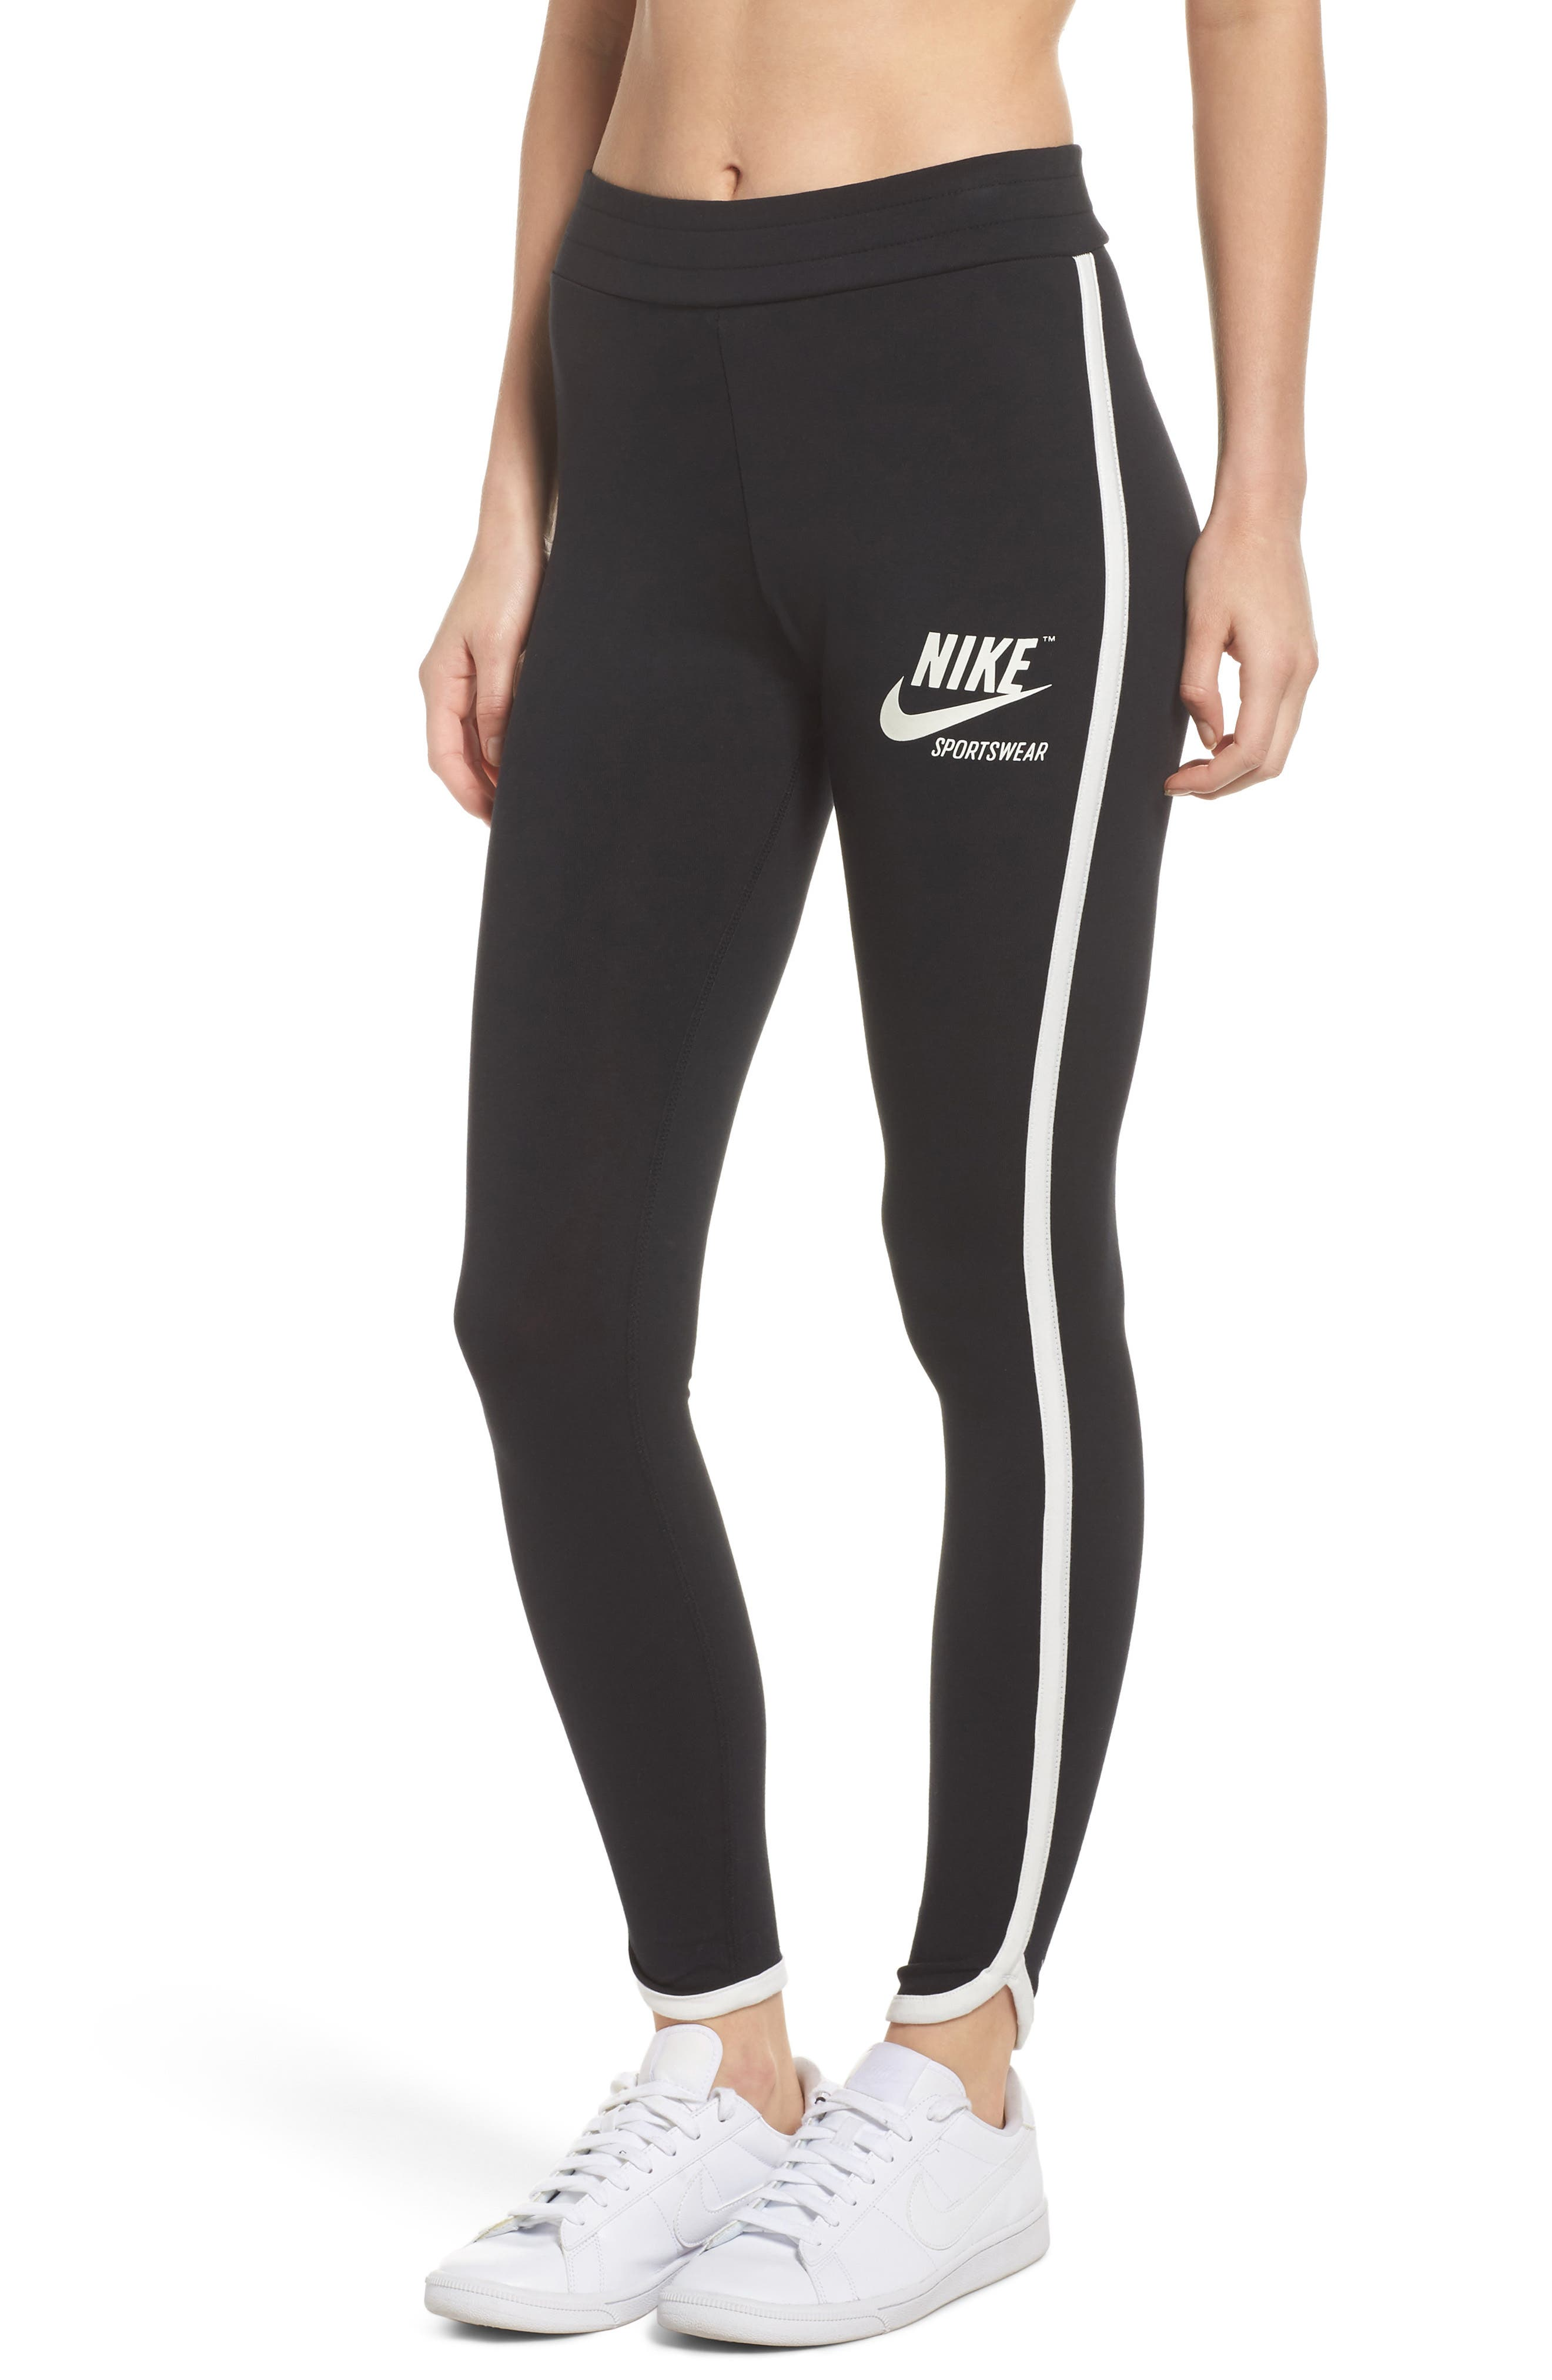 Sportswear Women's Leggings,                         Main,                         color, Black/ Sail